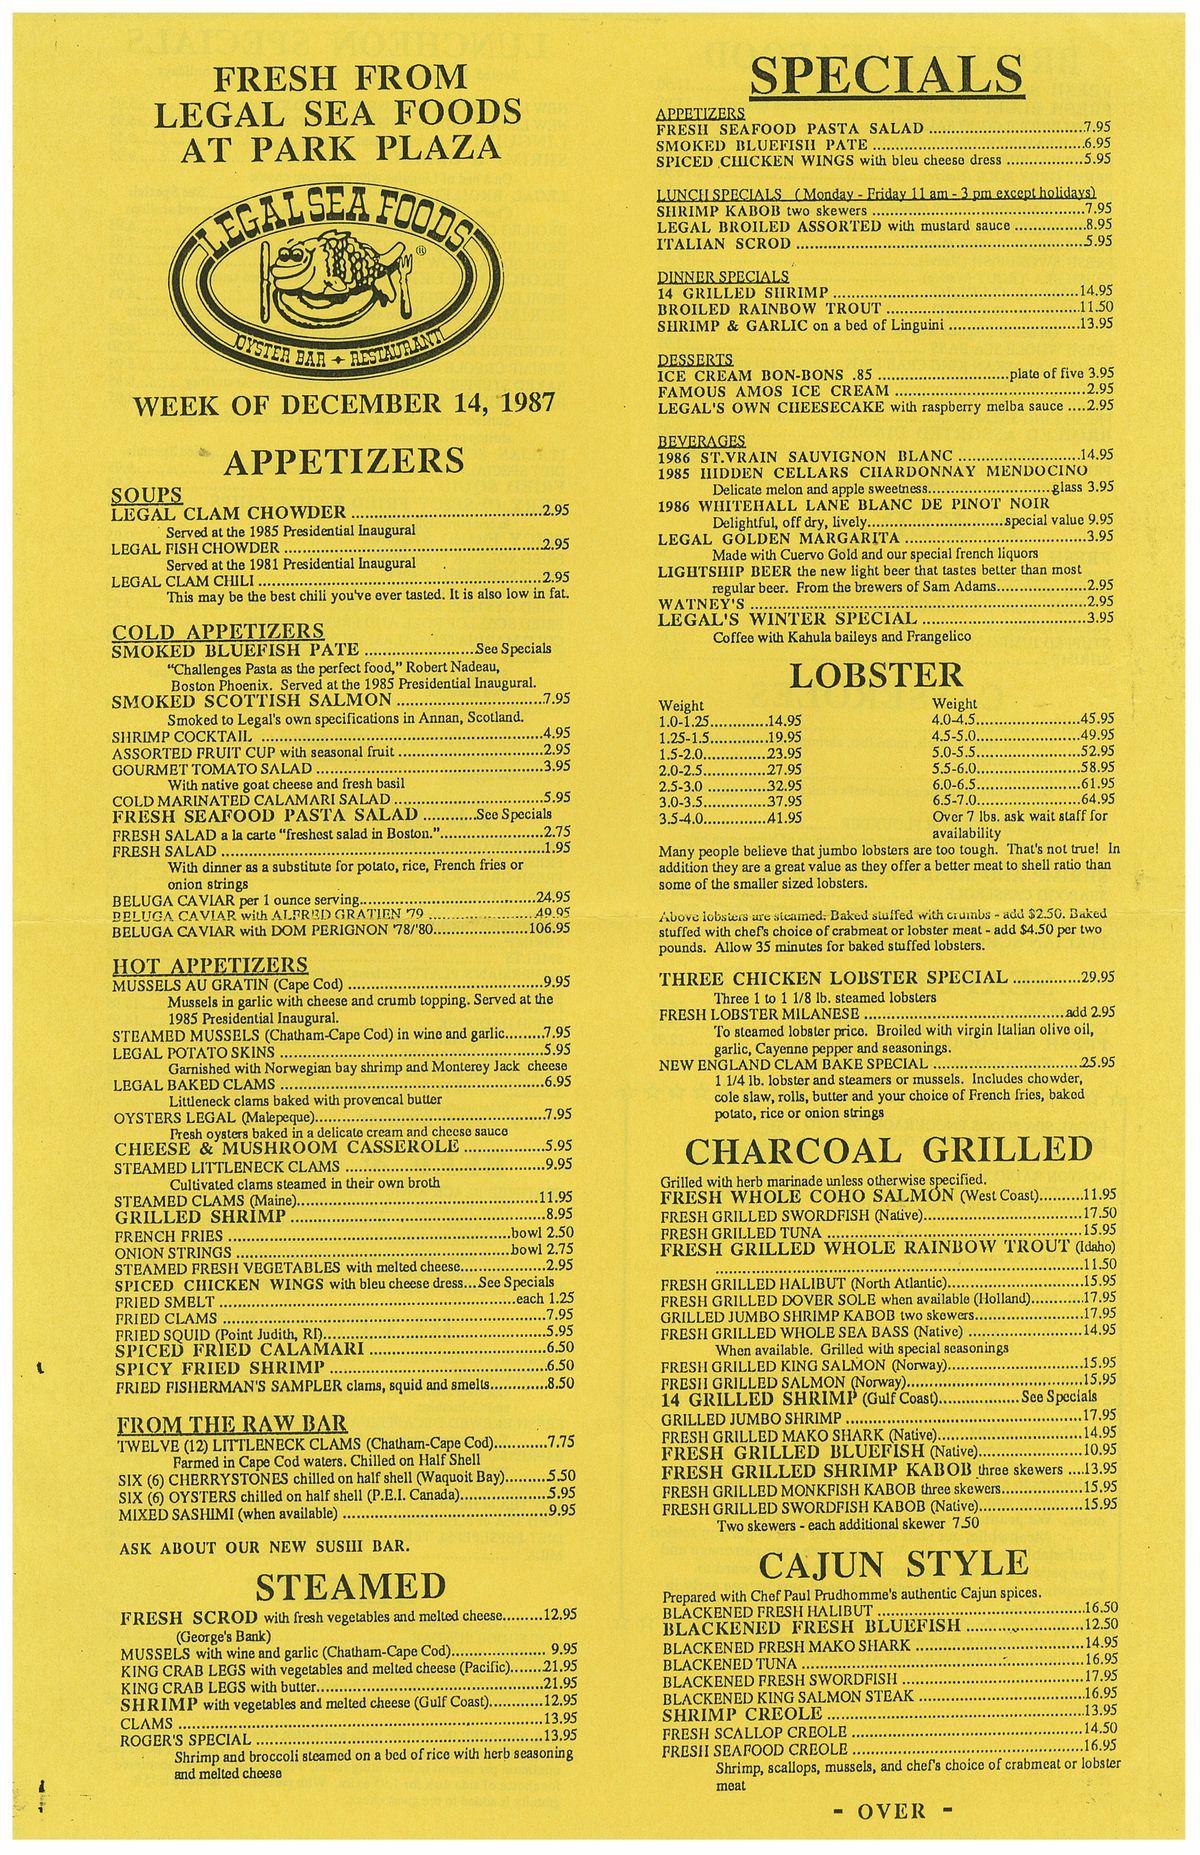 Legal Sea Foods Park Plaza 1987 menu